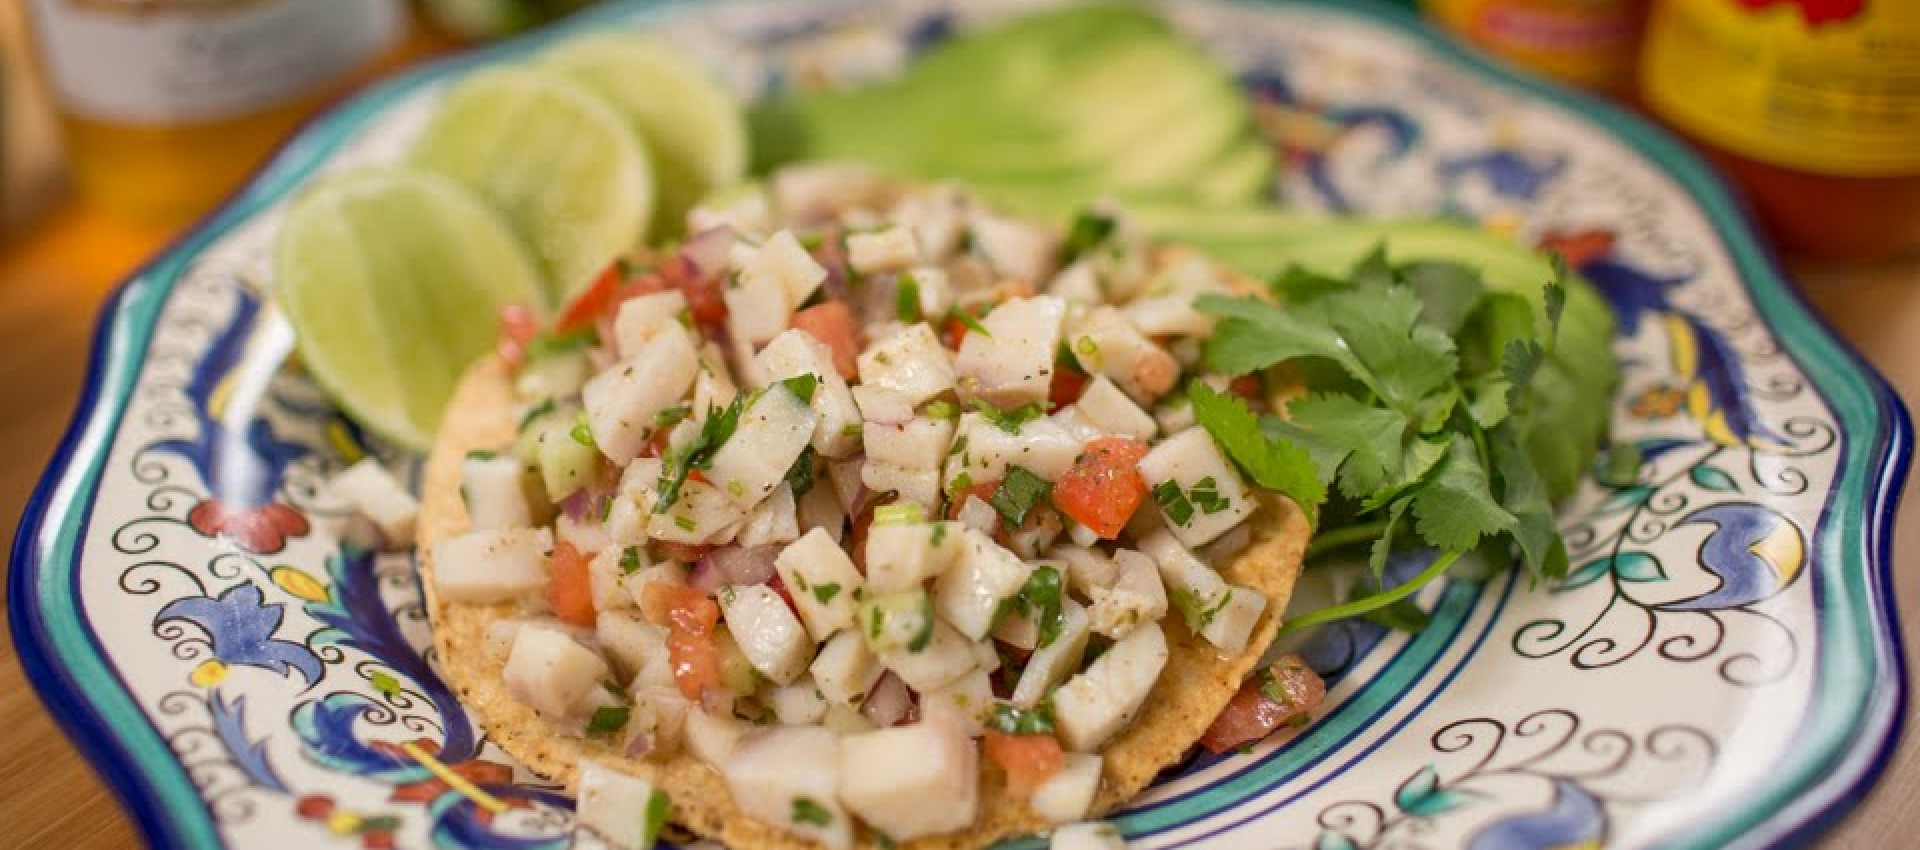 Imagen de Ceviche Mexicano